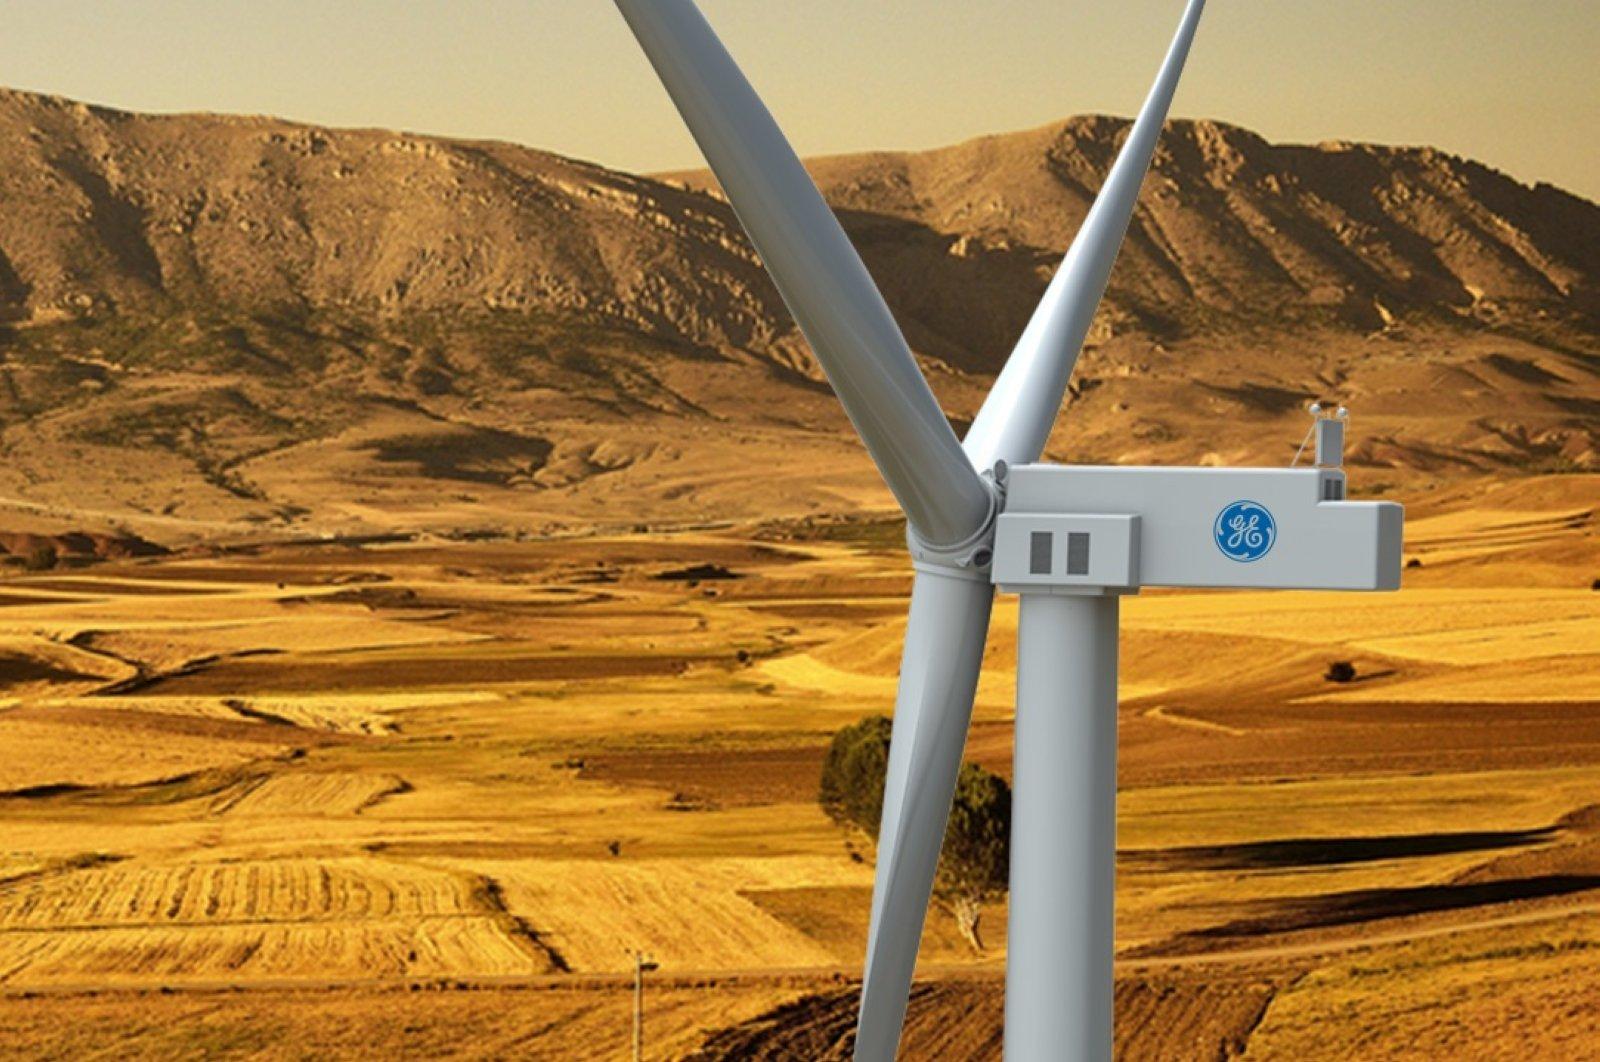 Image courtesy of GE Renewable Energy.